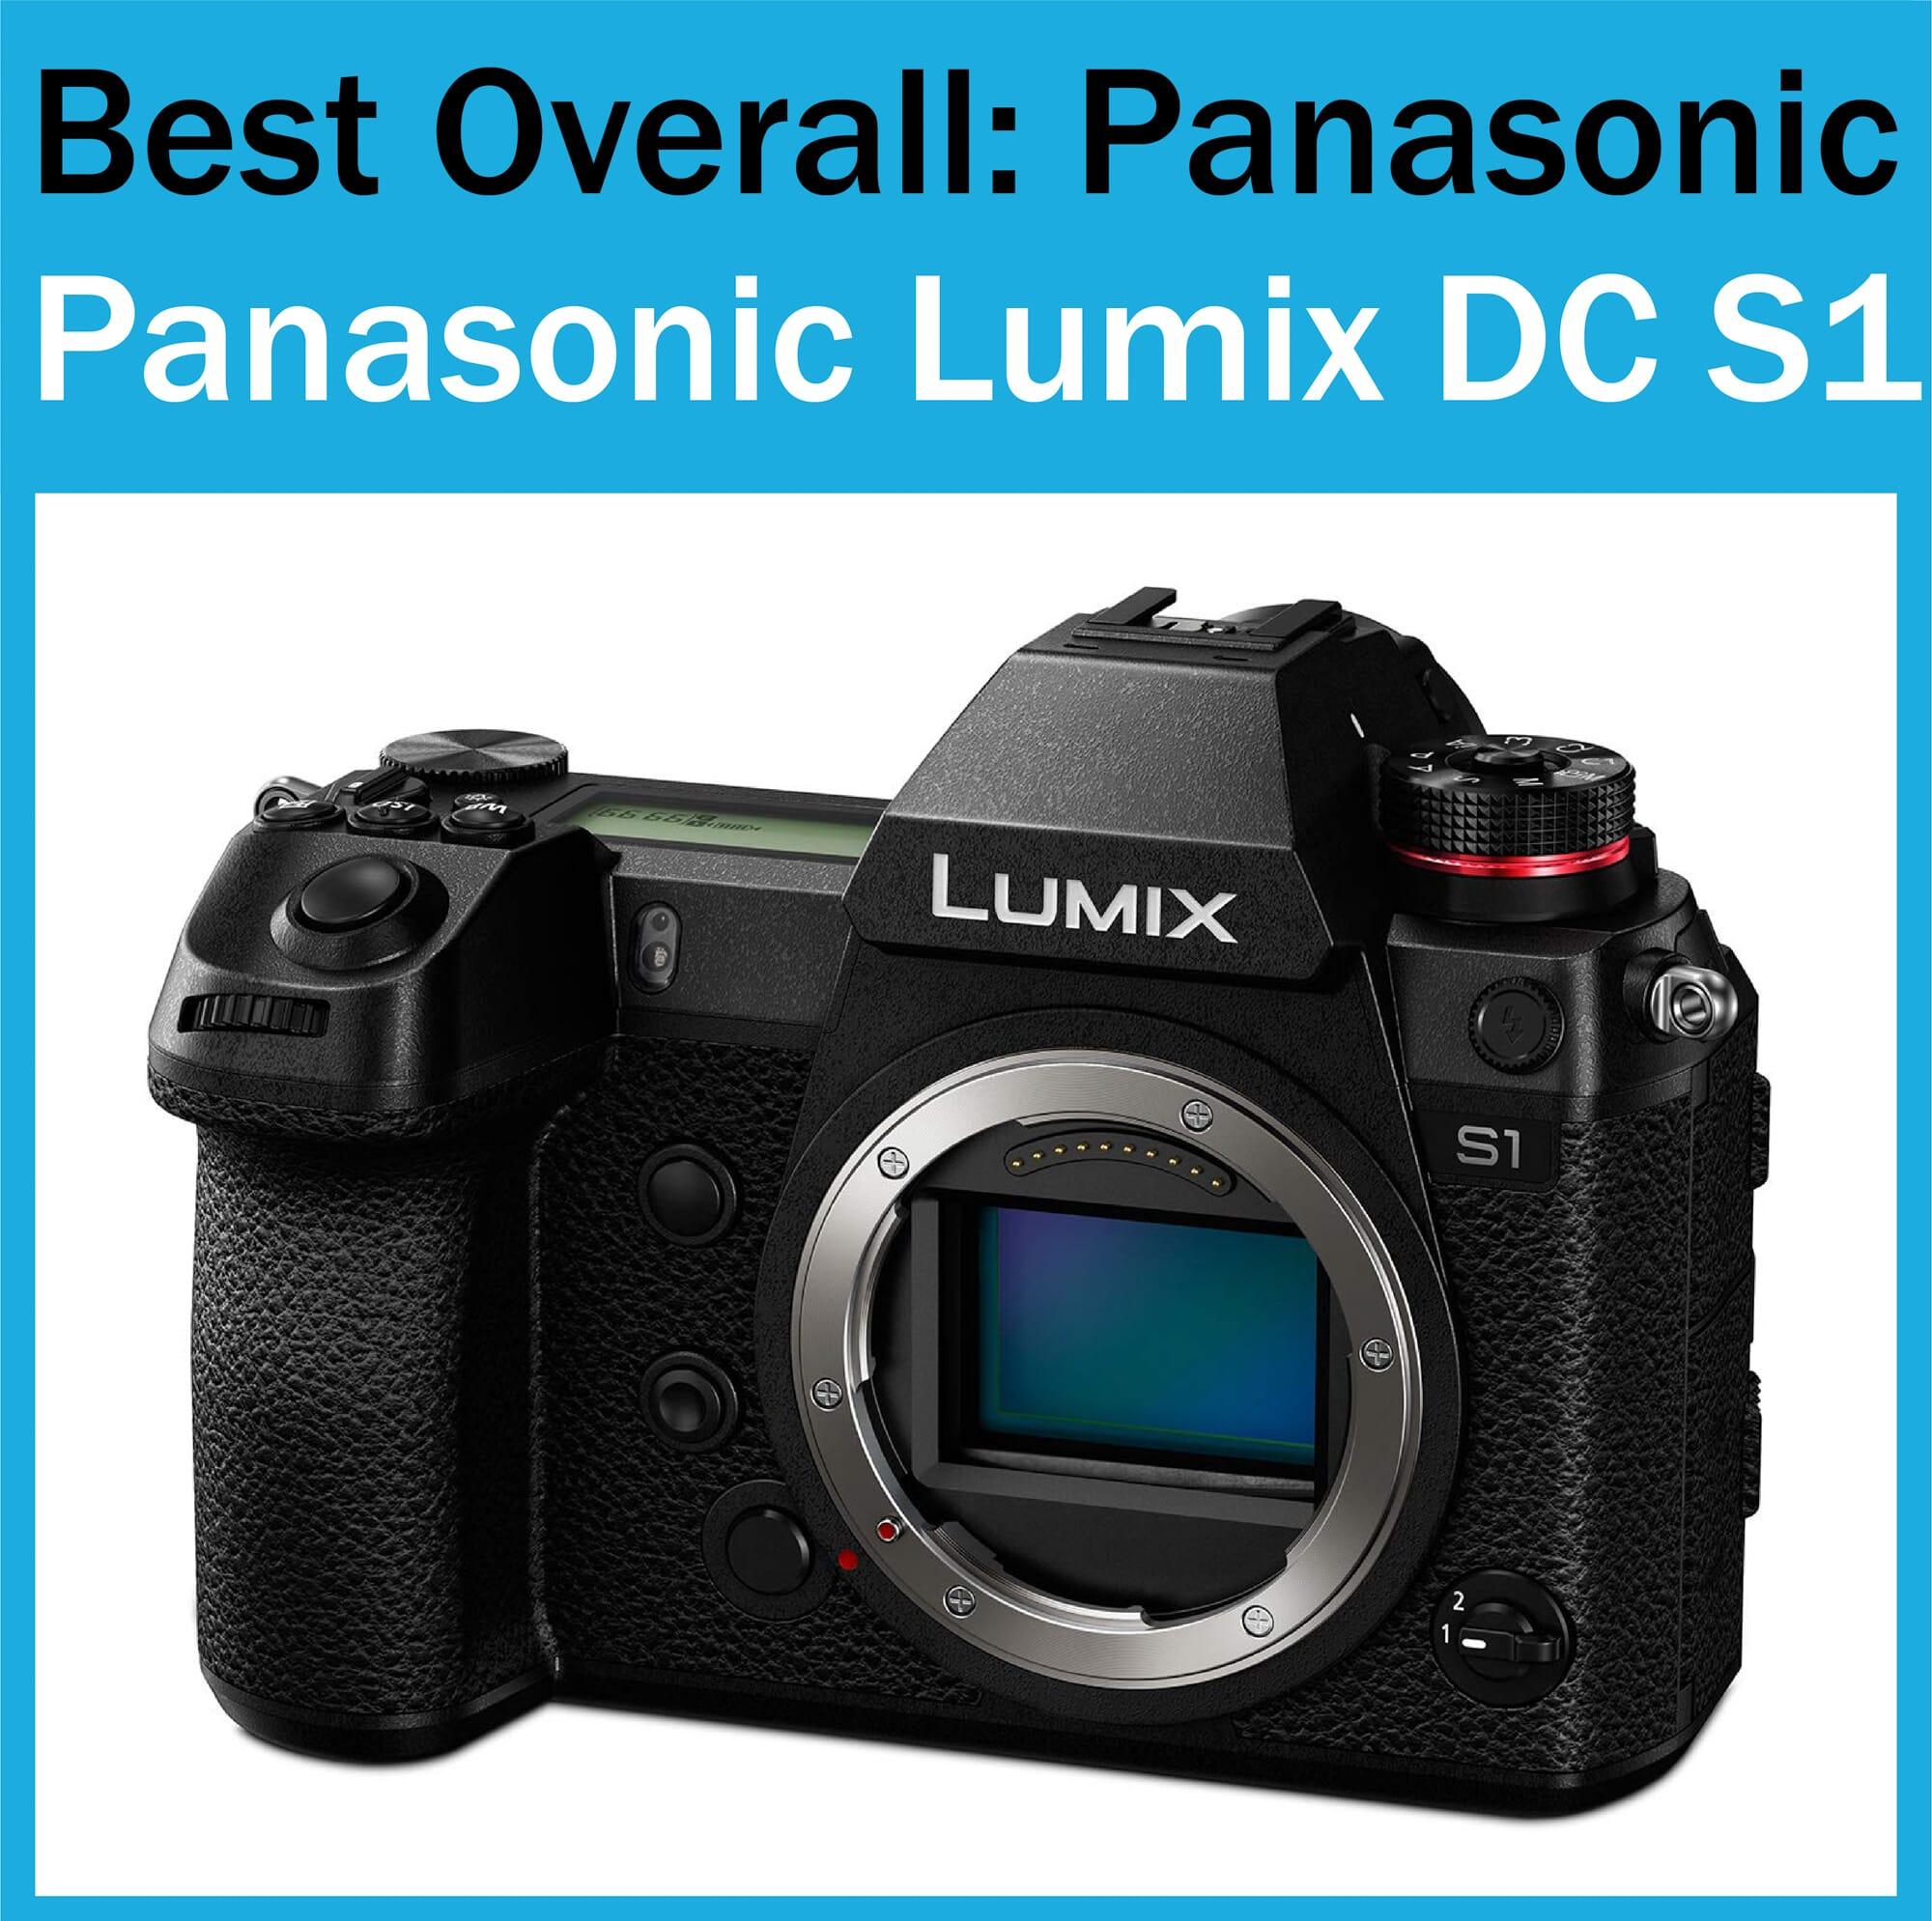 Best Full Frame Camera Panasonic Lumix DC S1